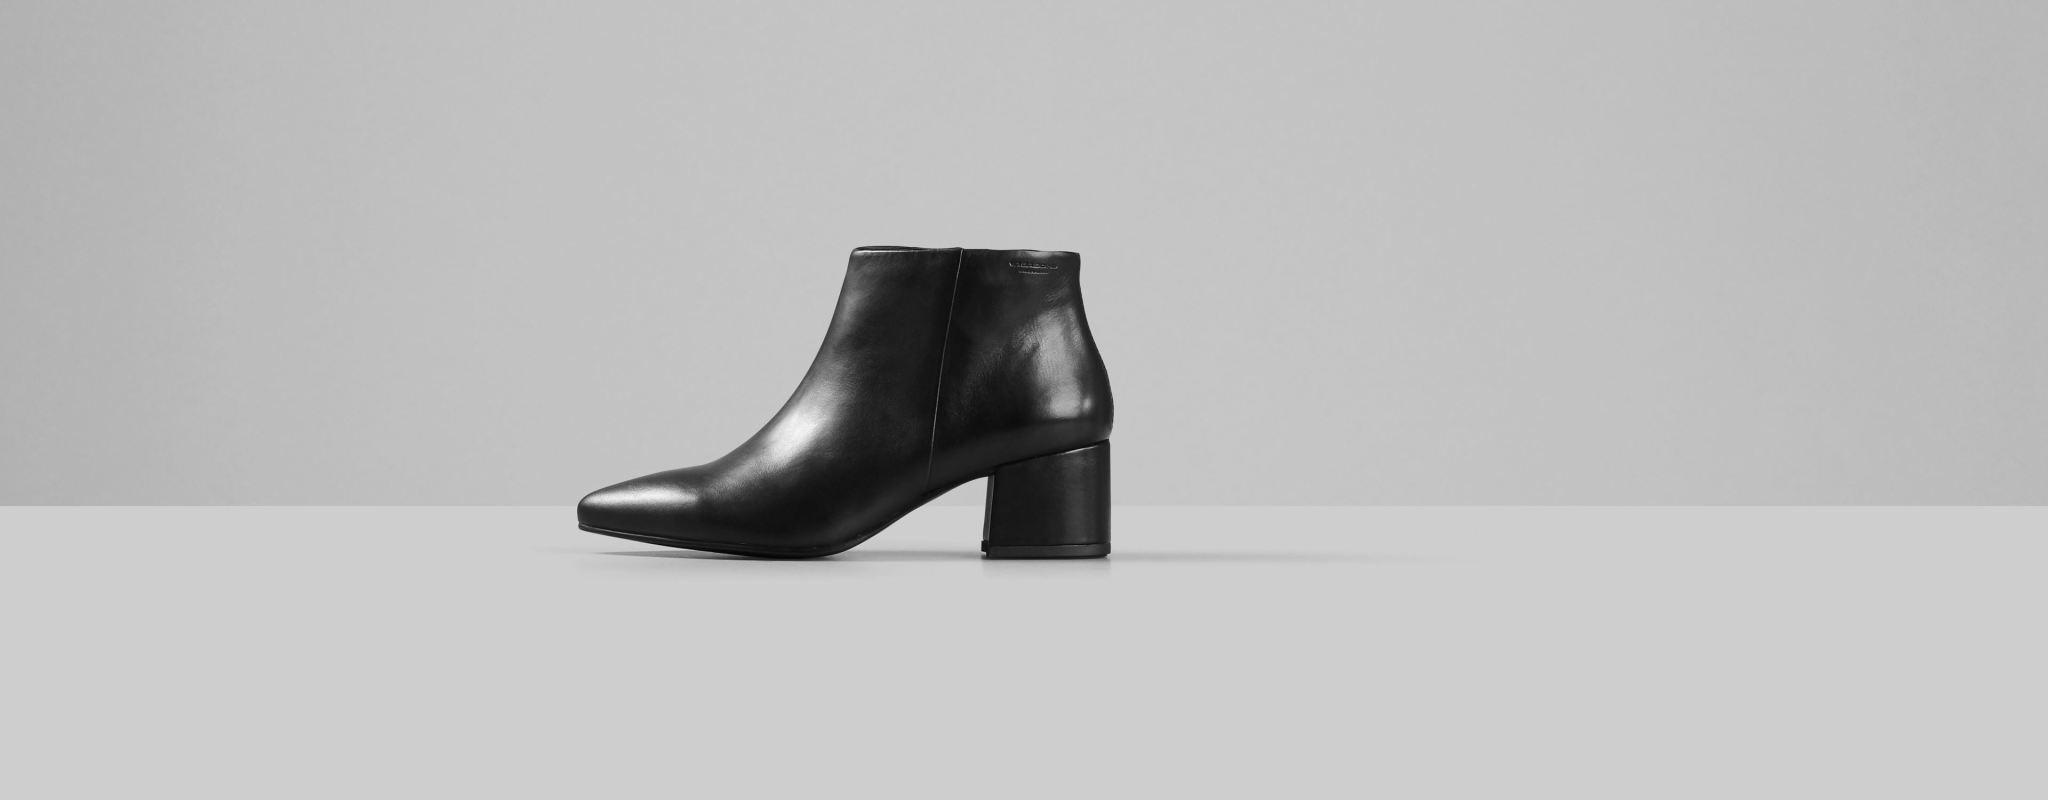 Mya Half High Black Leather Boots-3